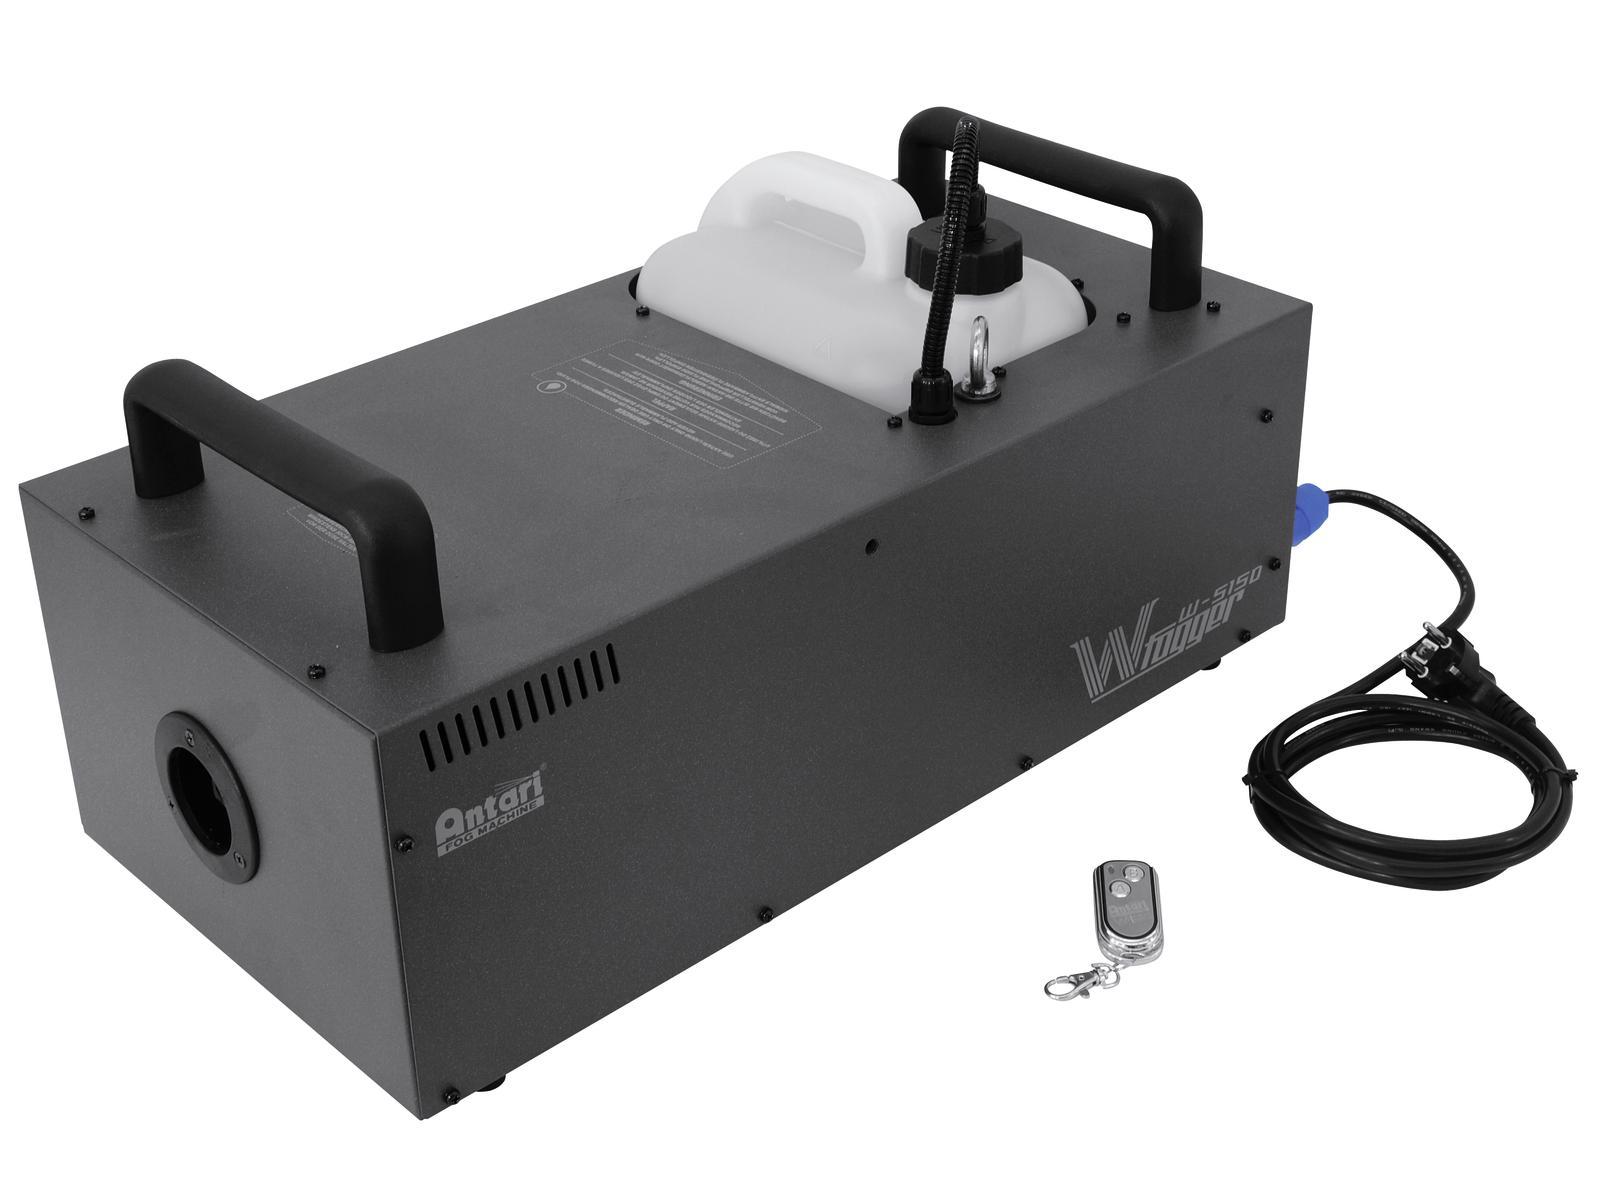 Fotografie Antari W-515D Pro výrobník mlhy 1500W